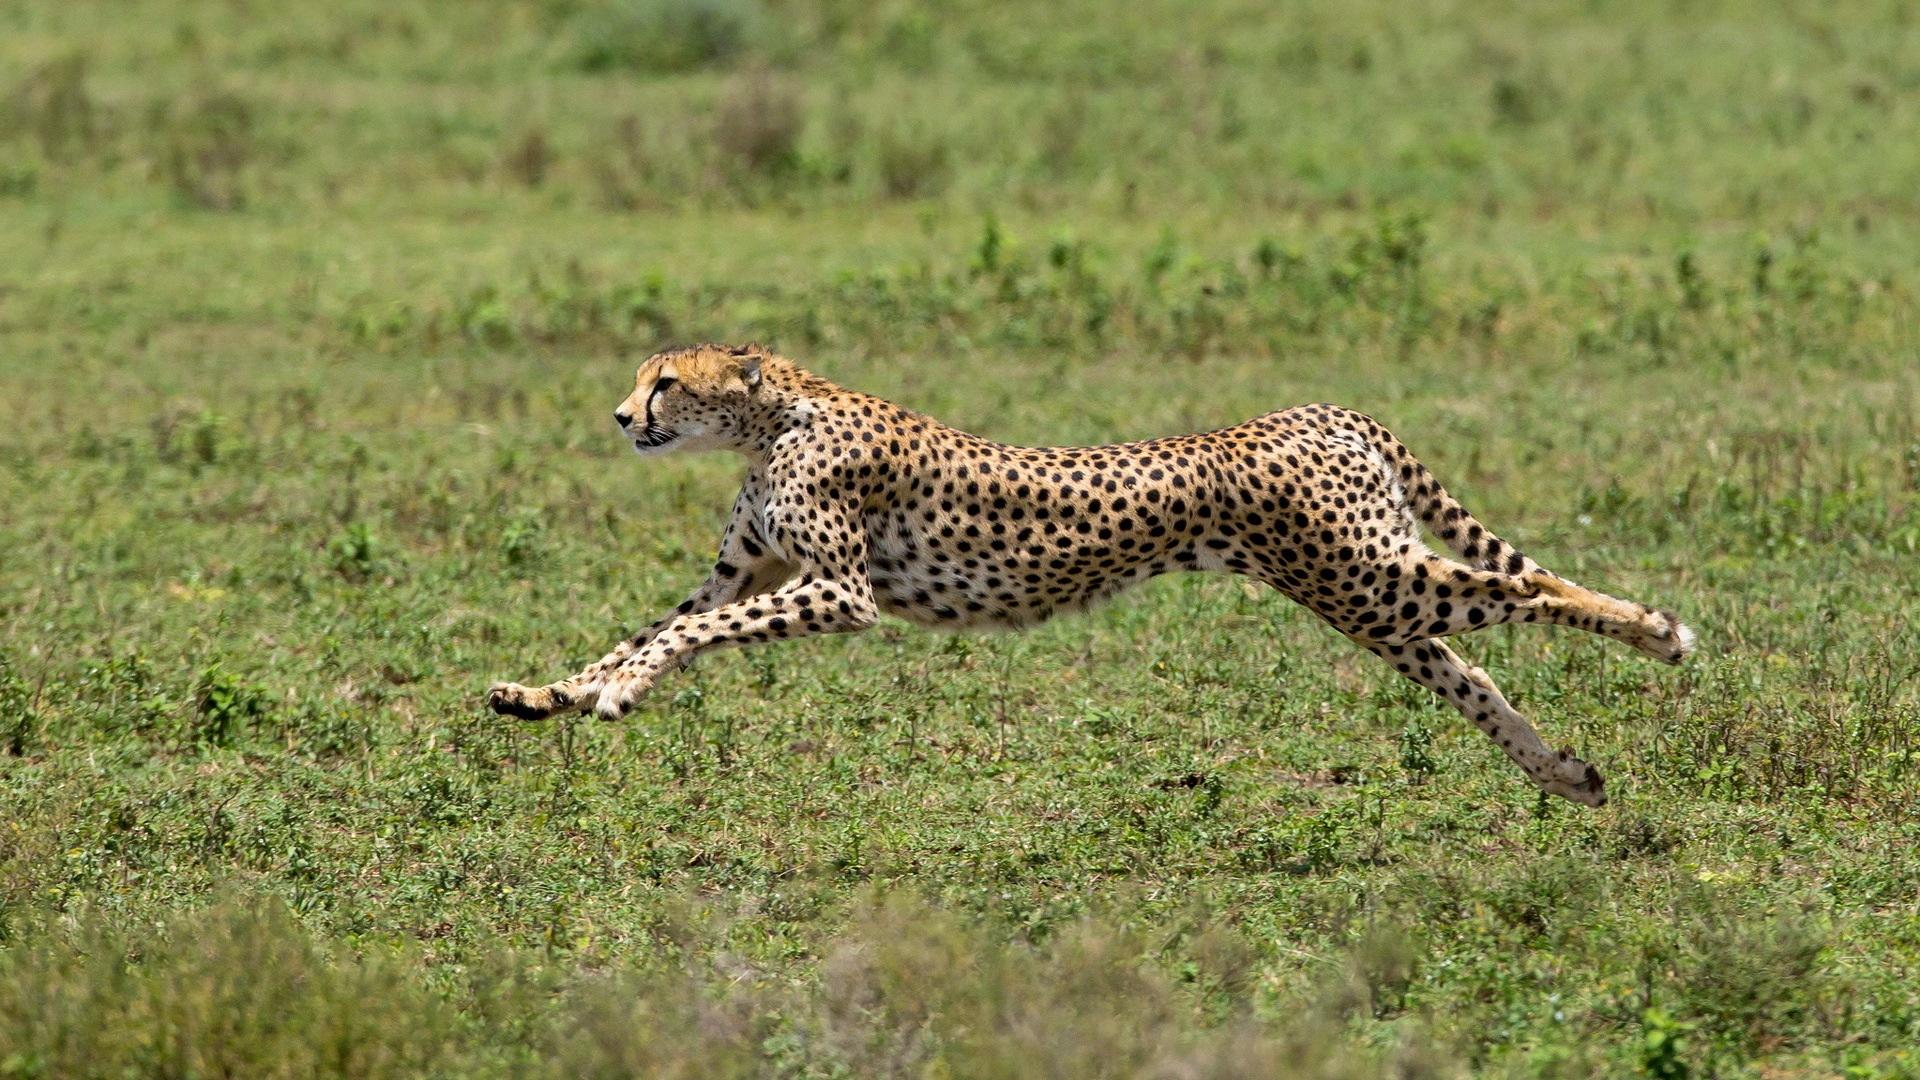 Black Panther Animal Wallpaper Cheetah Acinonyx Jubatus Help Change The World The